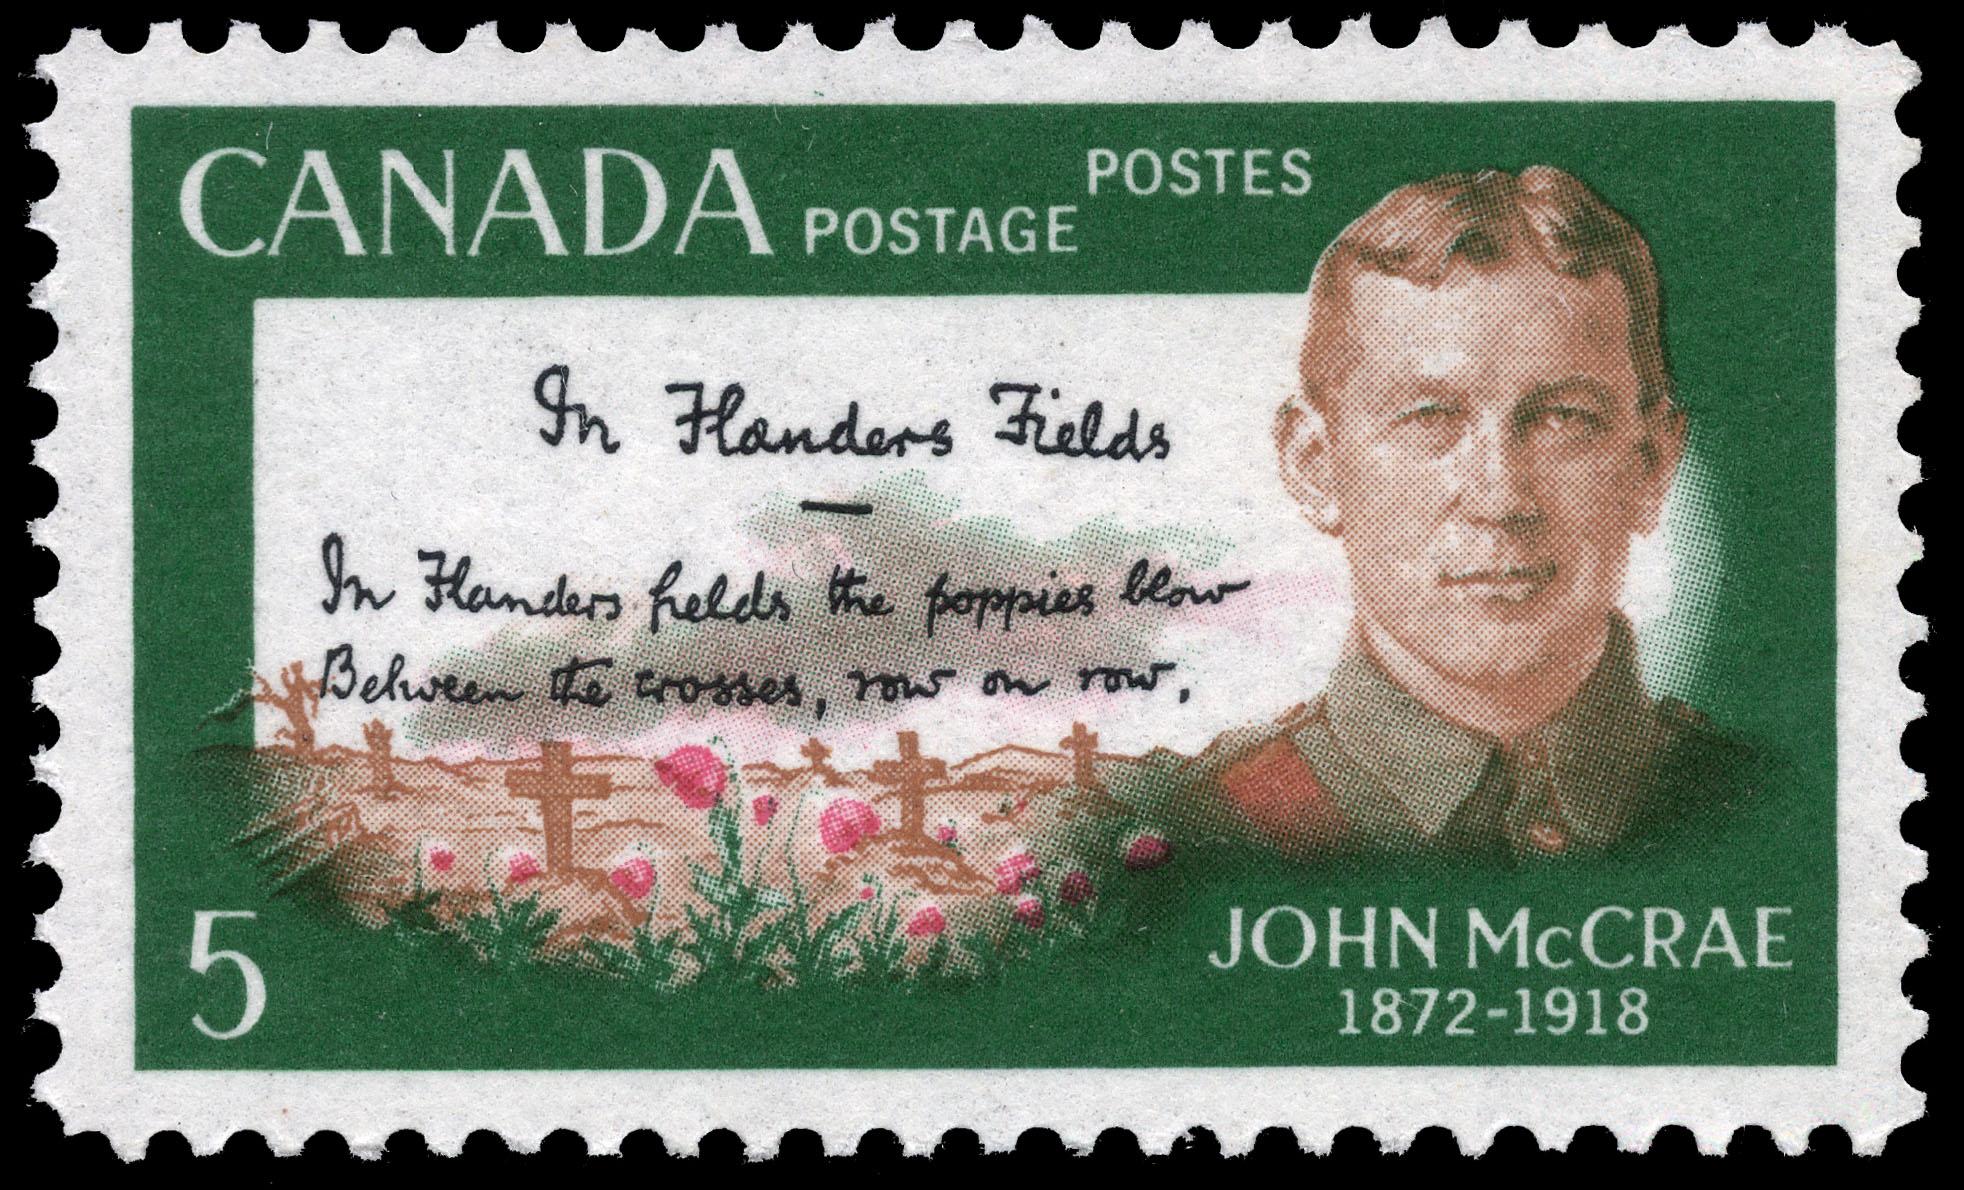 John McCrae, 1872-1918, In Flanders Field Canada Postage Stamp